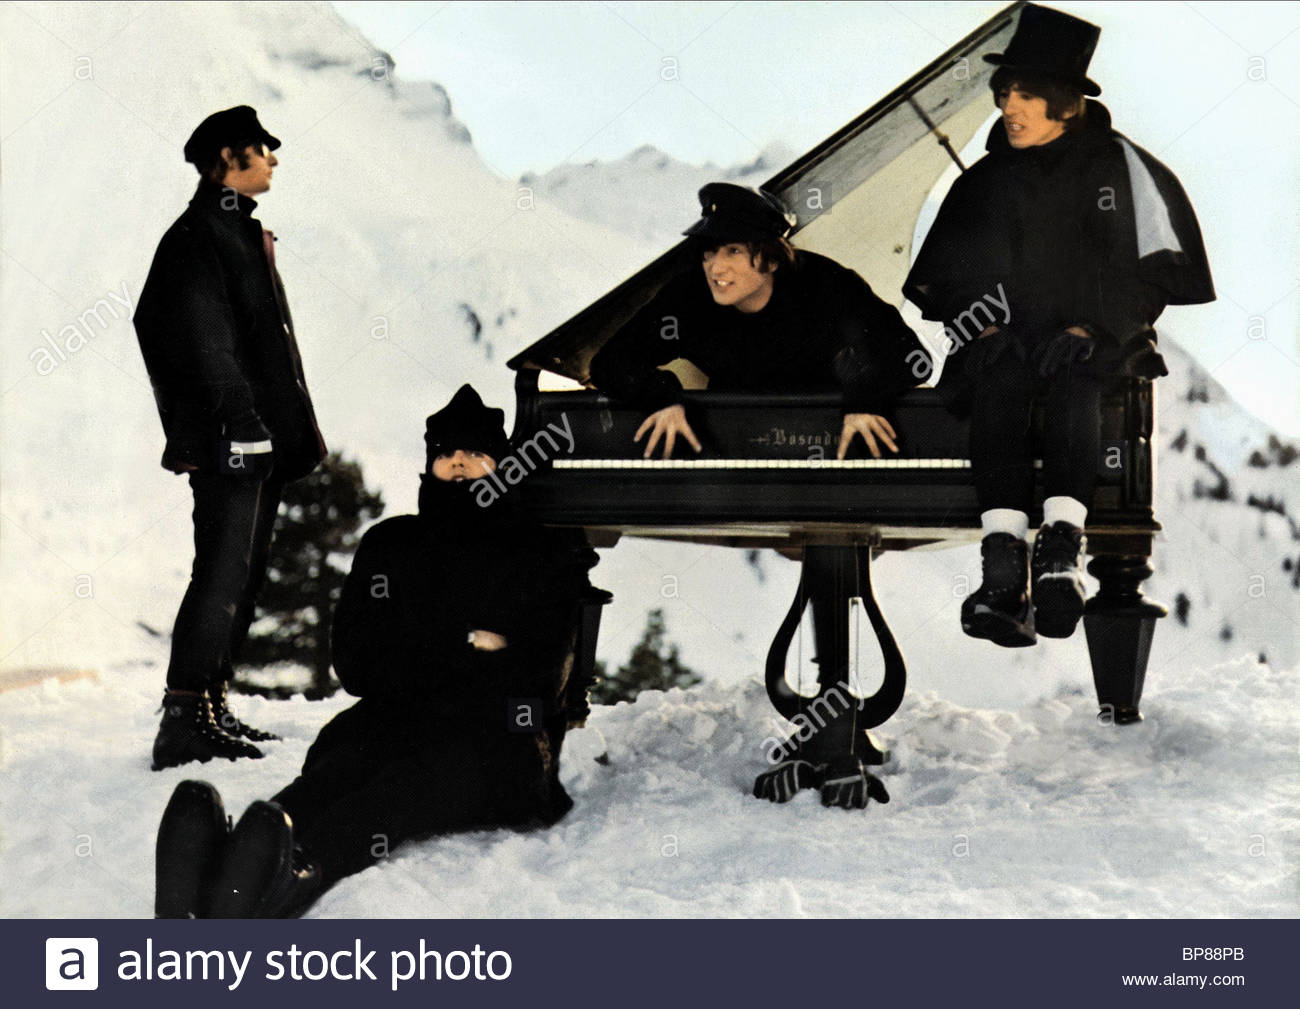 RINGO STARR PAUL MCCARTNEY JOHN LENNON GEORGE HARRISON HELP! THE BEATLES (1965) - Stock Image